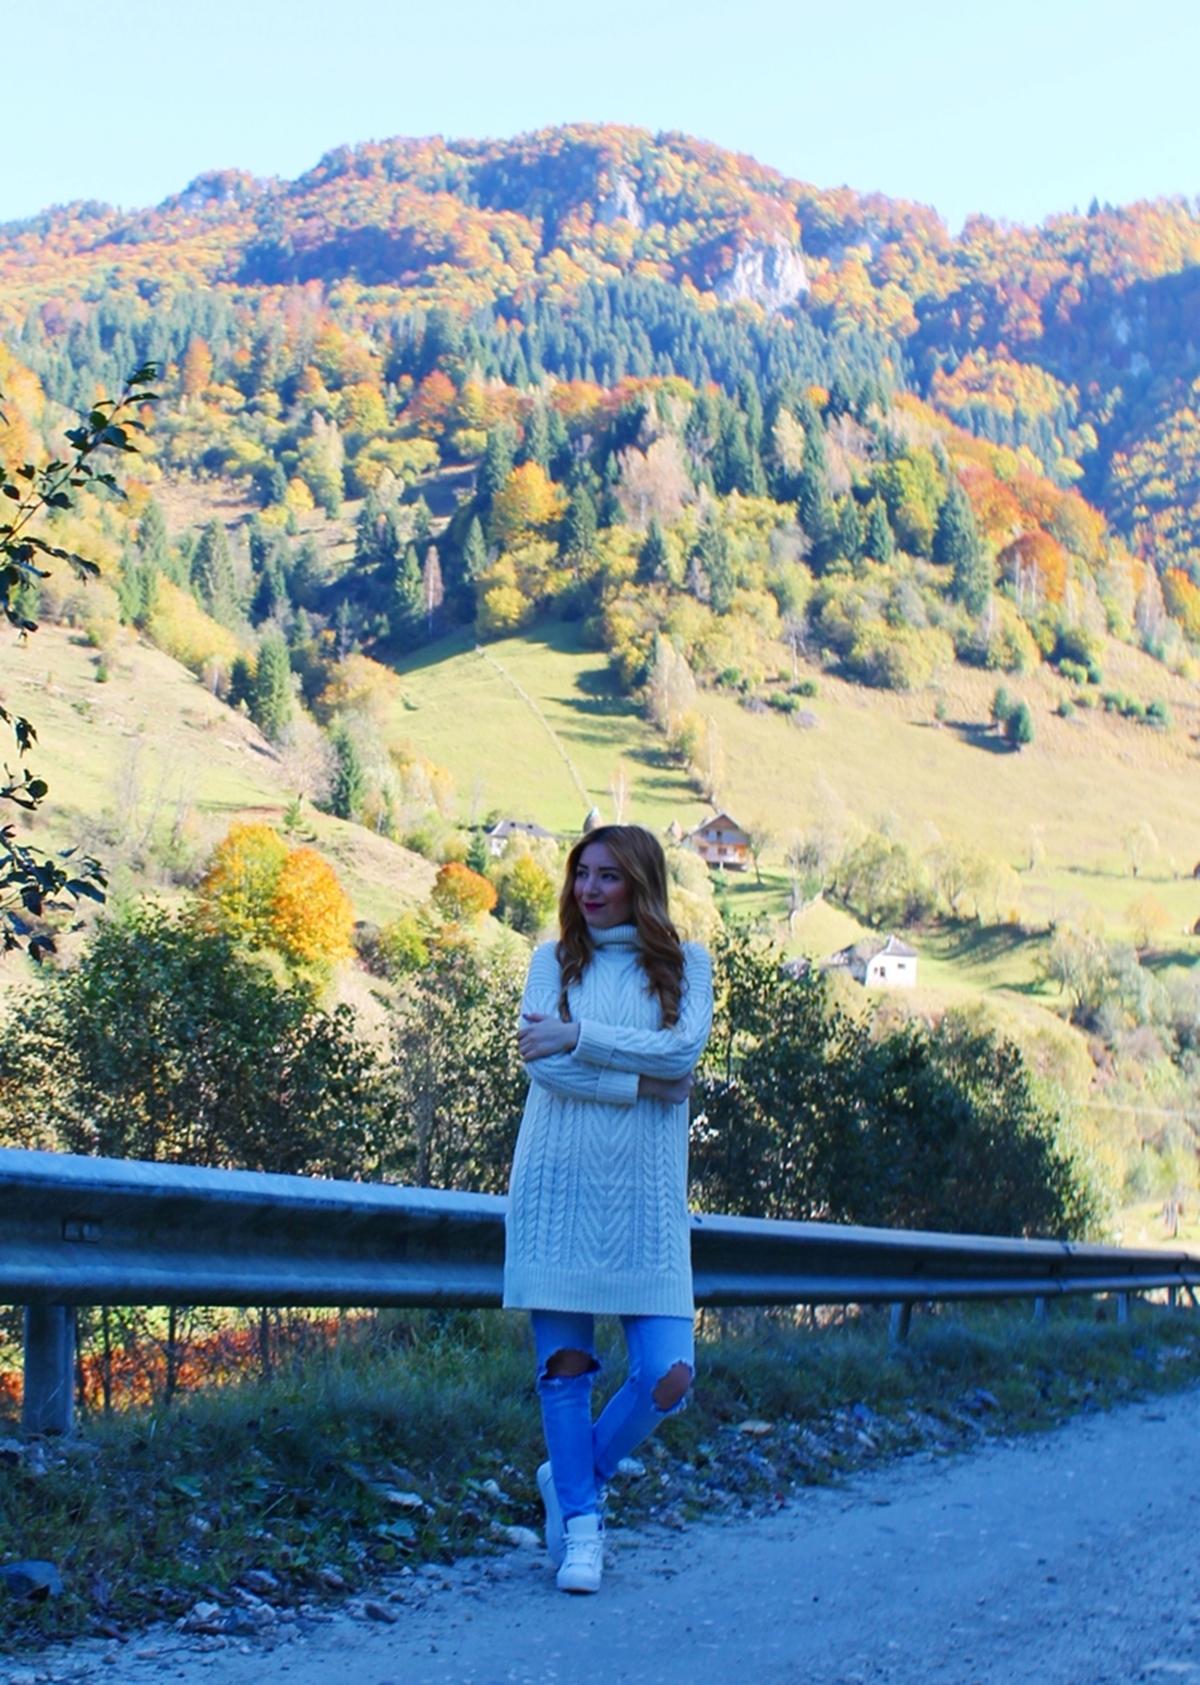 peisaj de munte toamna, rucar, saticul de jos, blogger, travel, andreea ristea, tinuta de munte